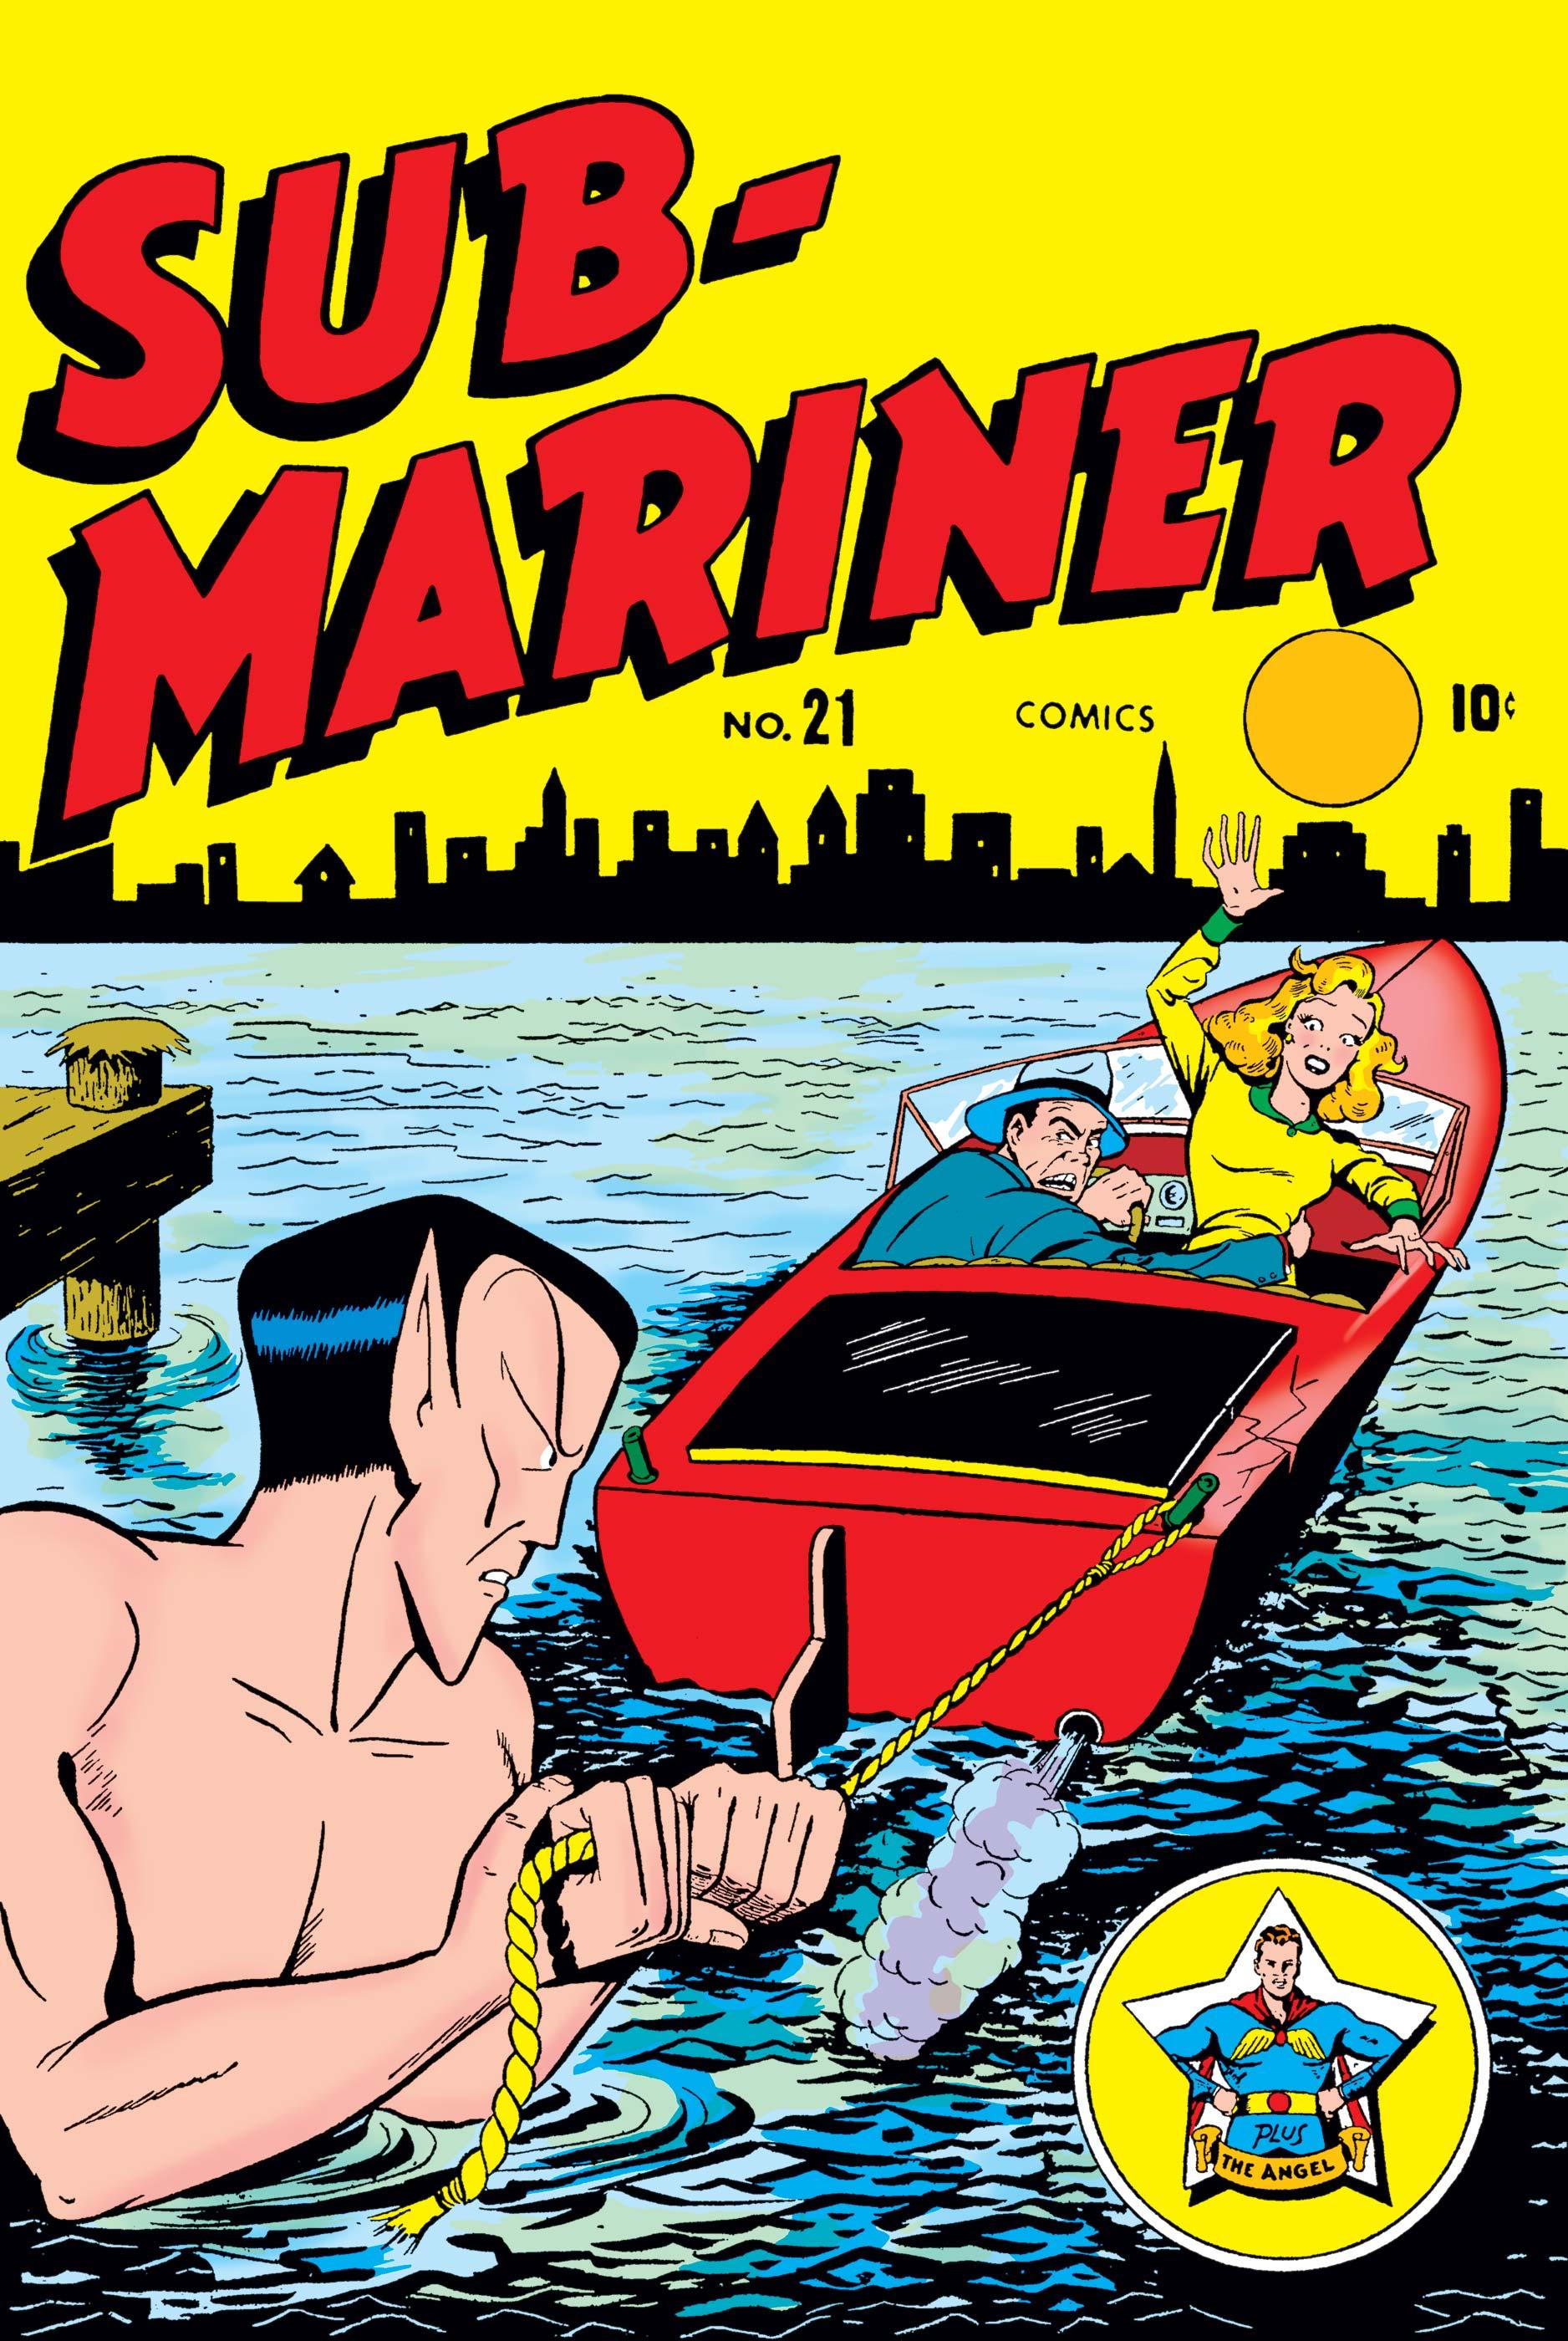 Sub-Mariner Comics (1941) #21